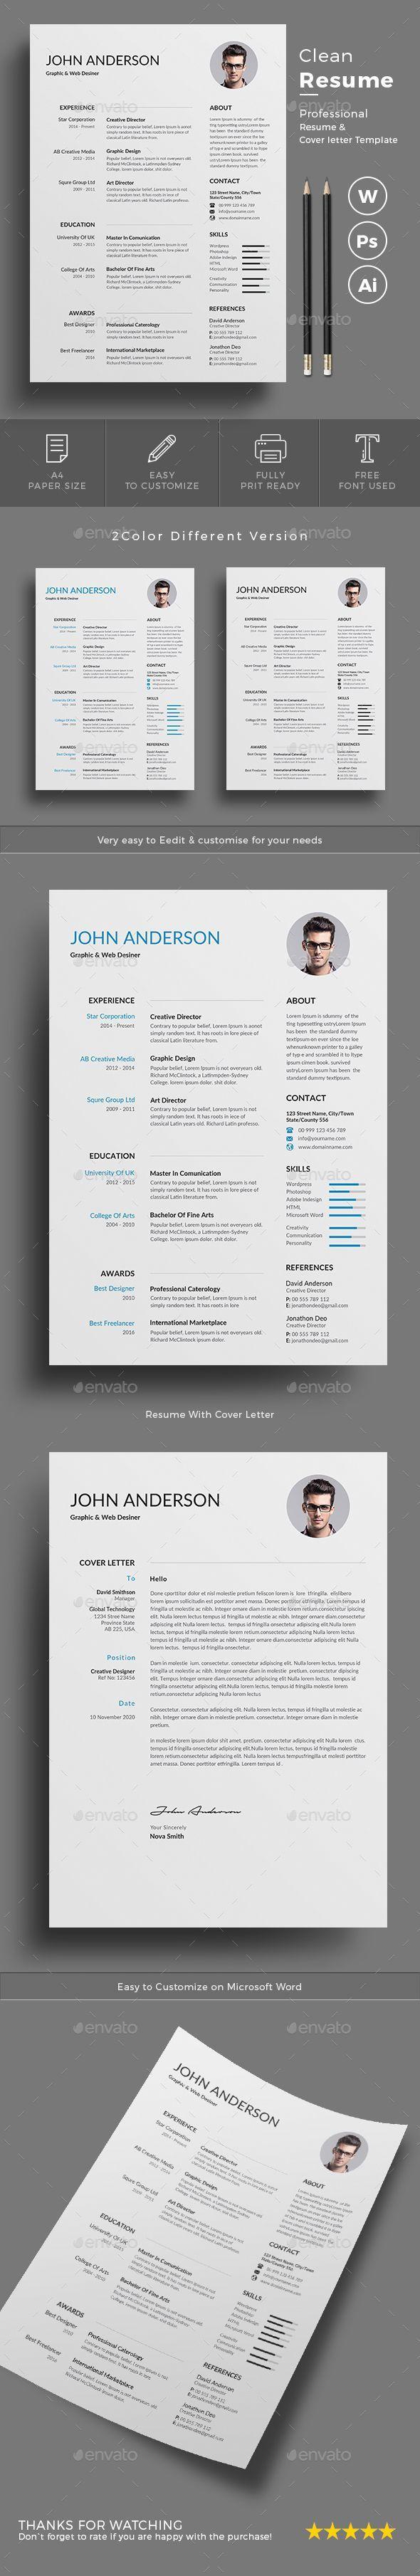 #Resume - Resumes Stationery Download here: https://graphicriver.net/item/resume/20132443?ref=jpixel55